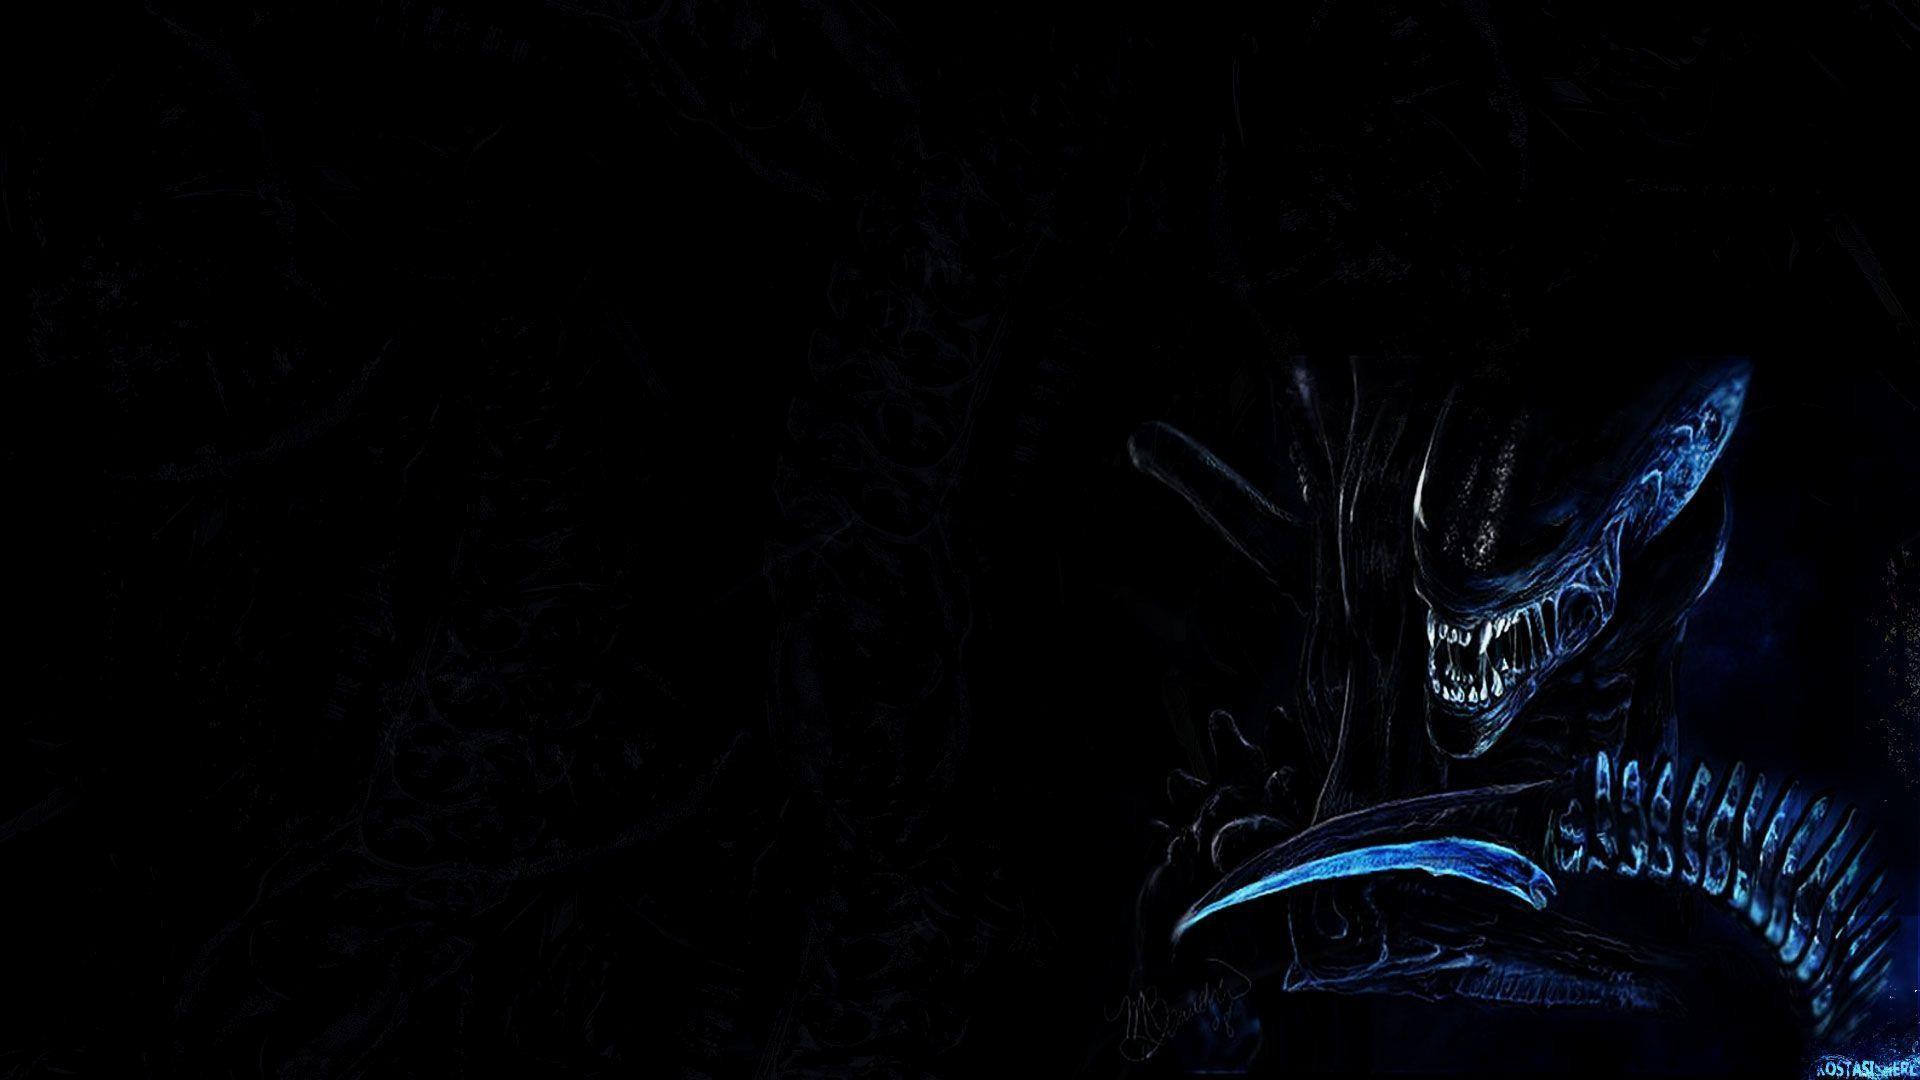 Space Alien Wallpaper (74+ images)